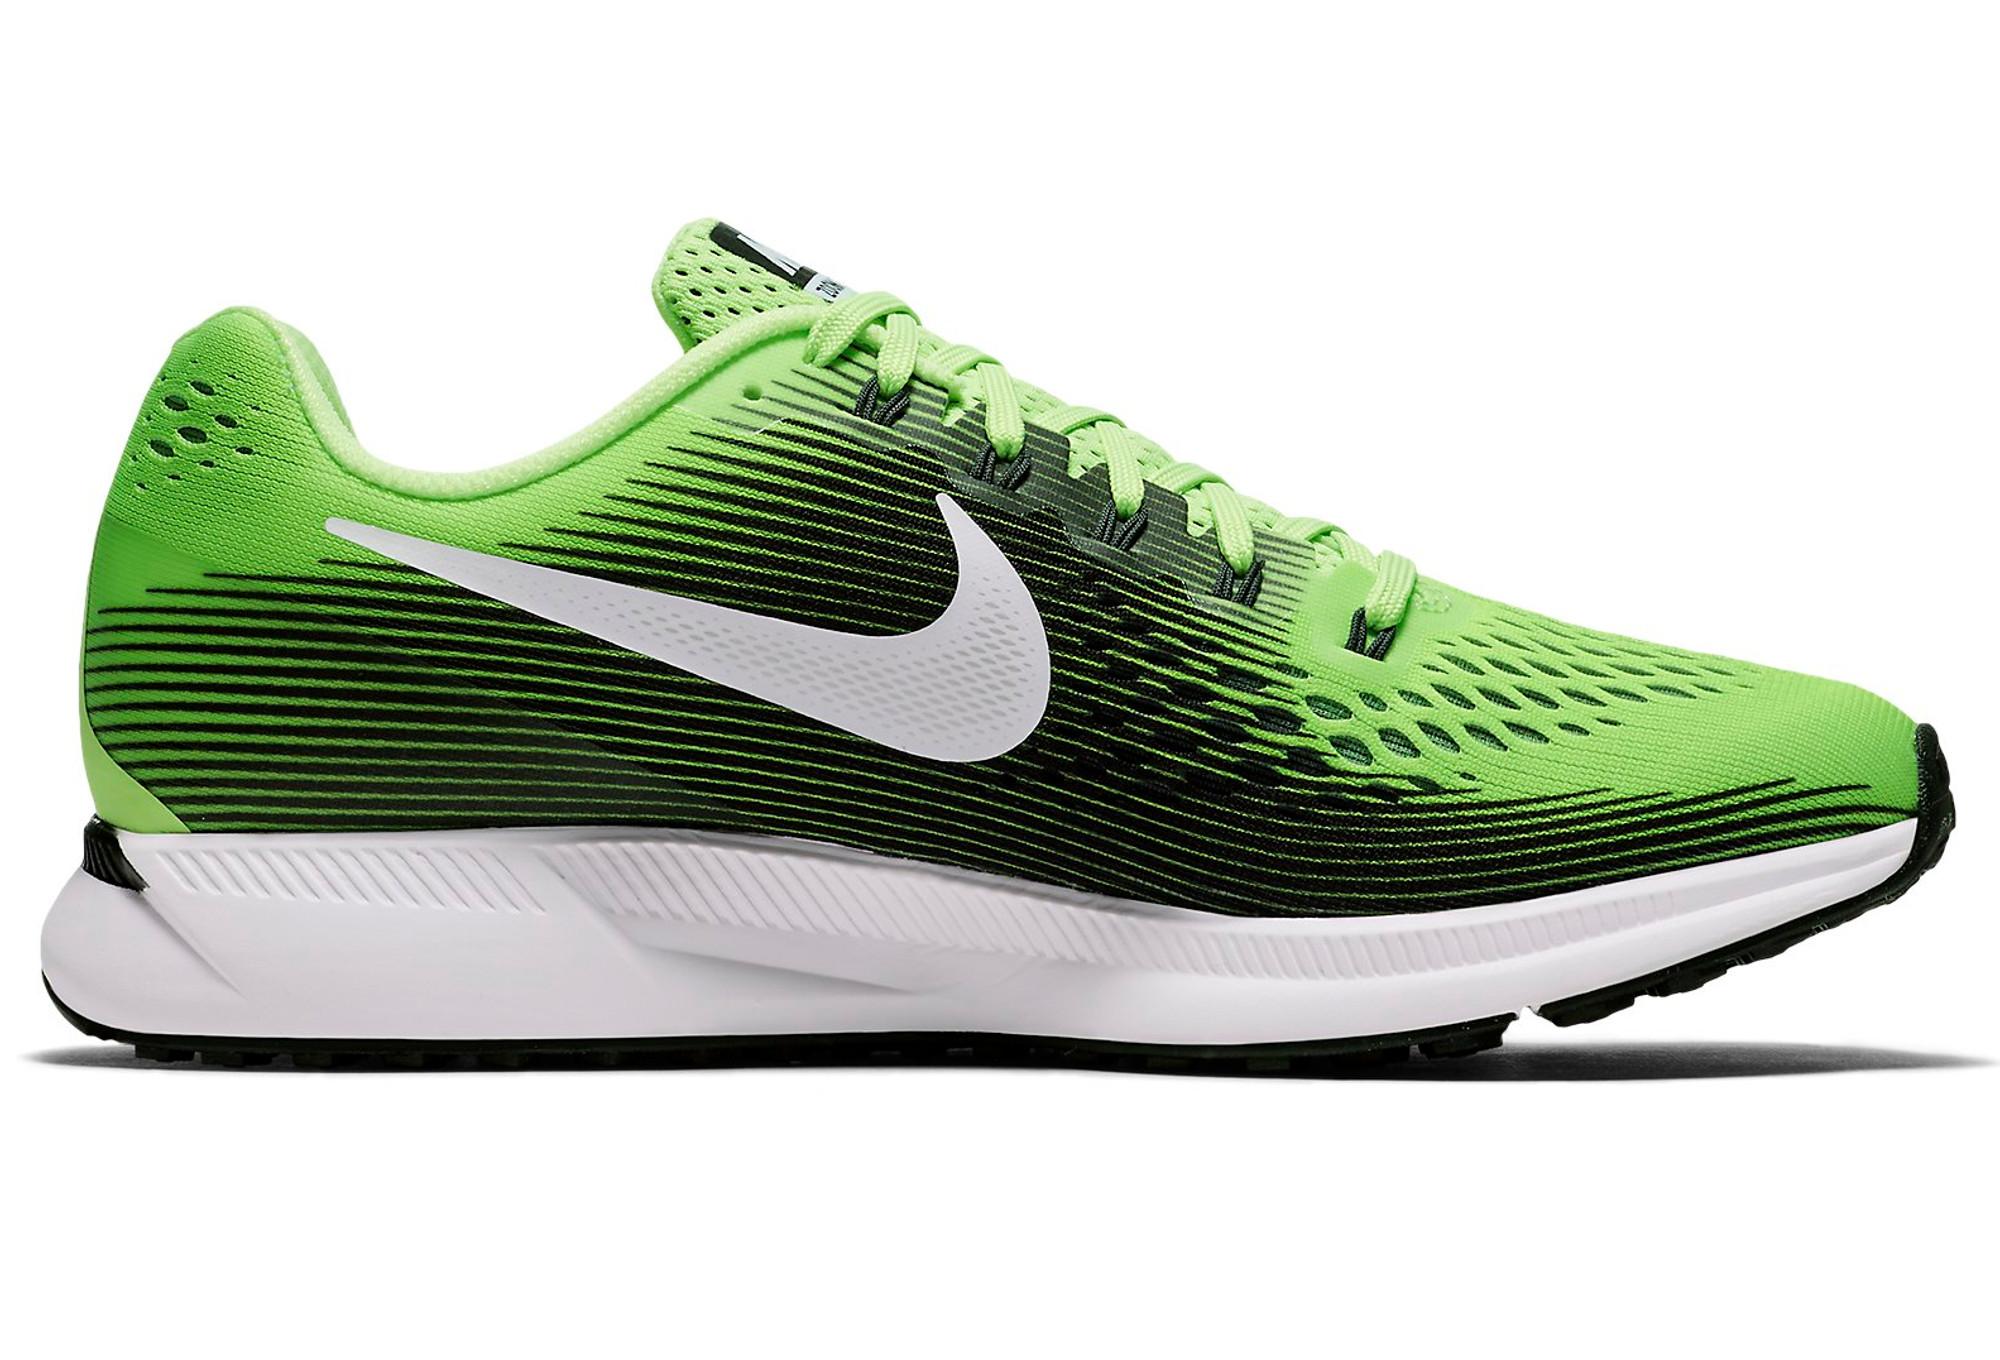 Chaussures de Running Nike Air Zoom Pegasus 34 Vert